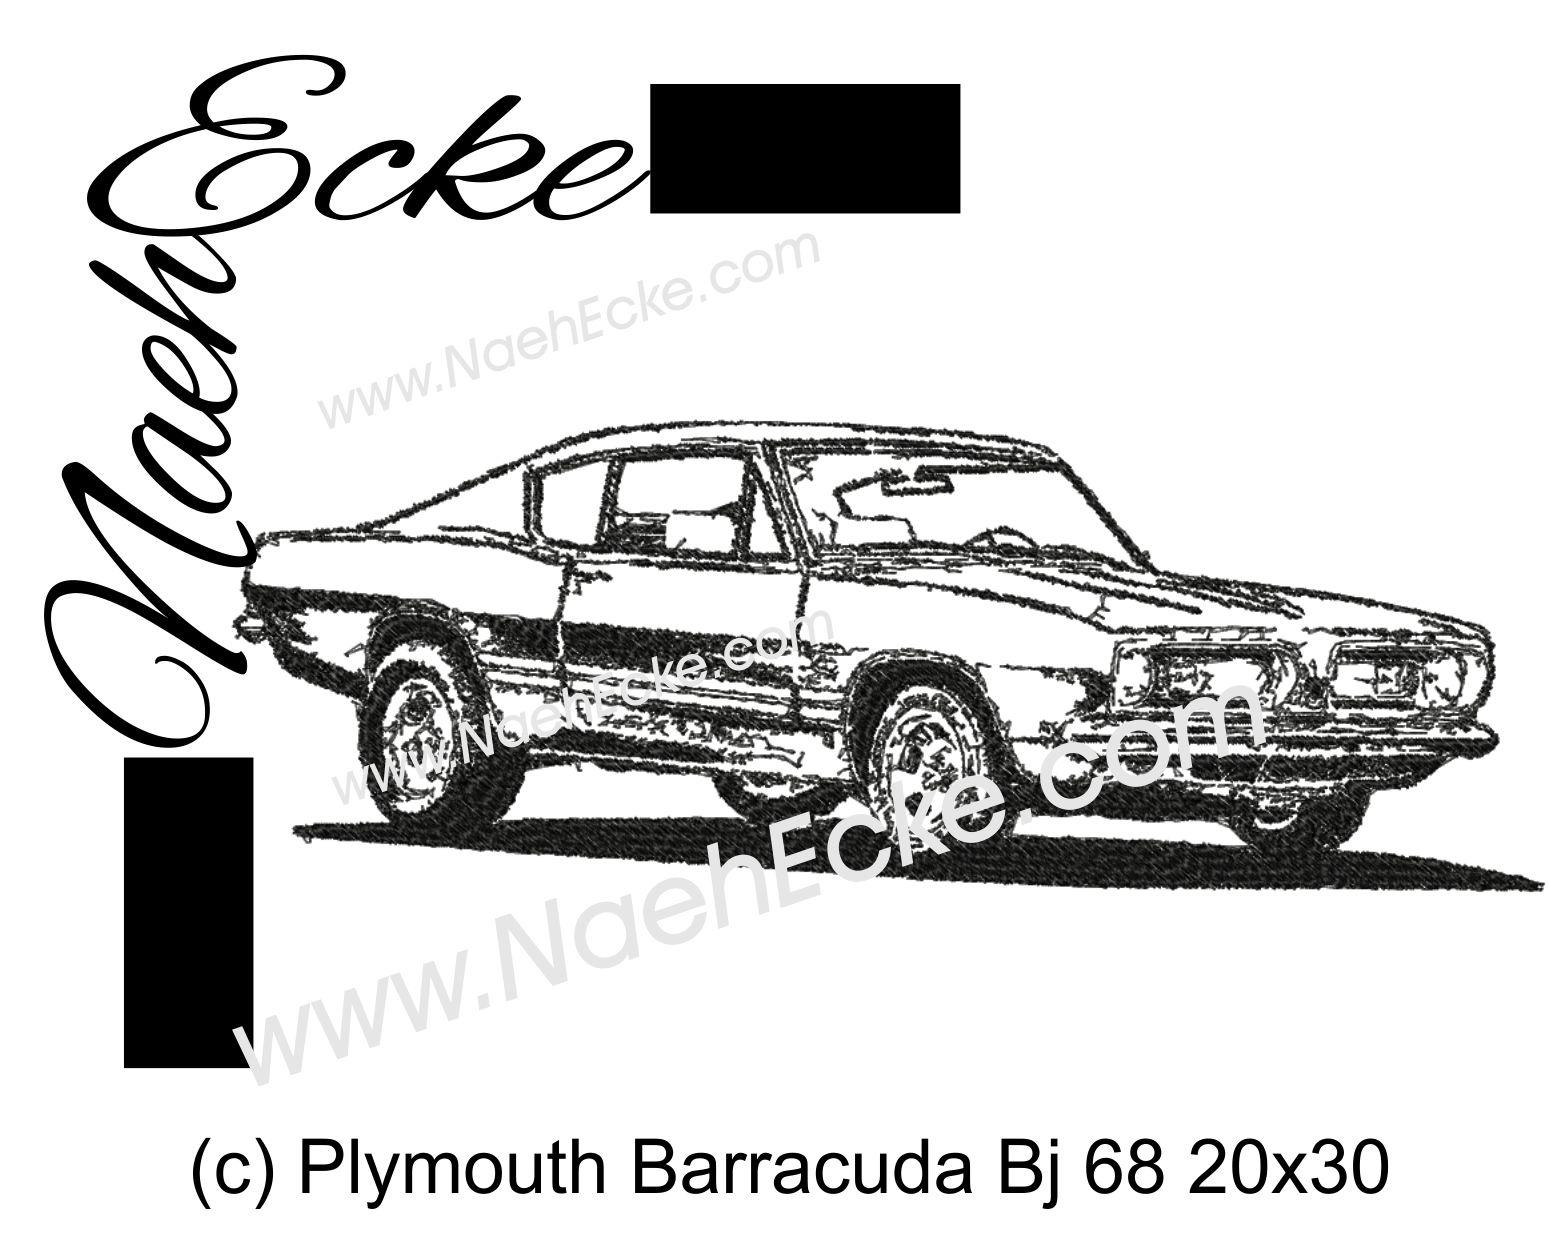 Barracuda Bj 68